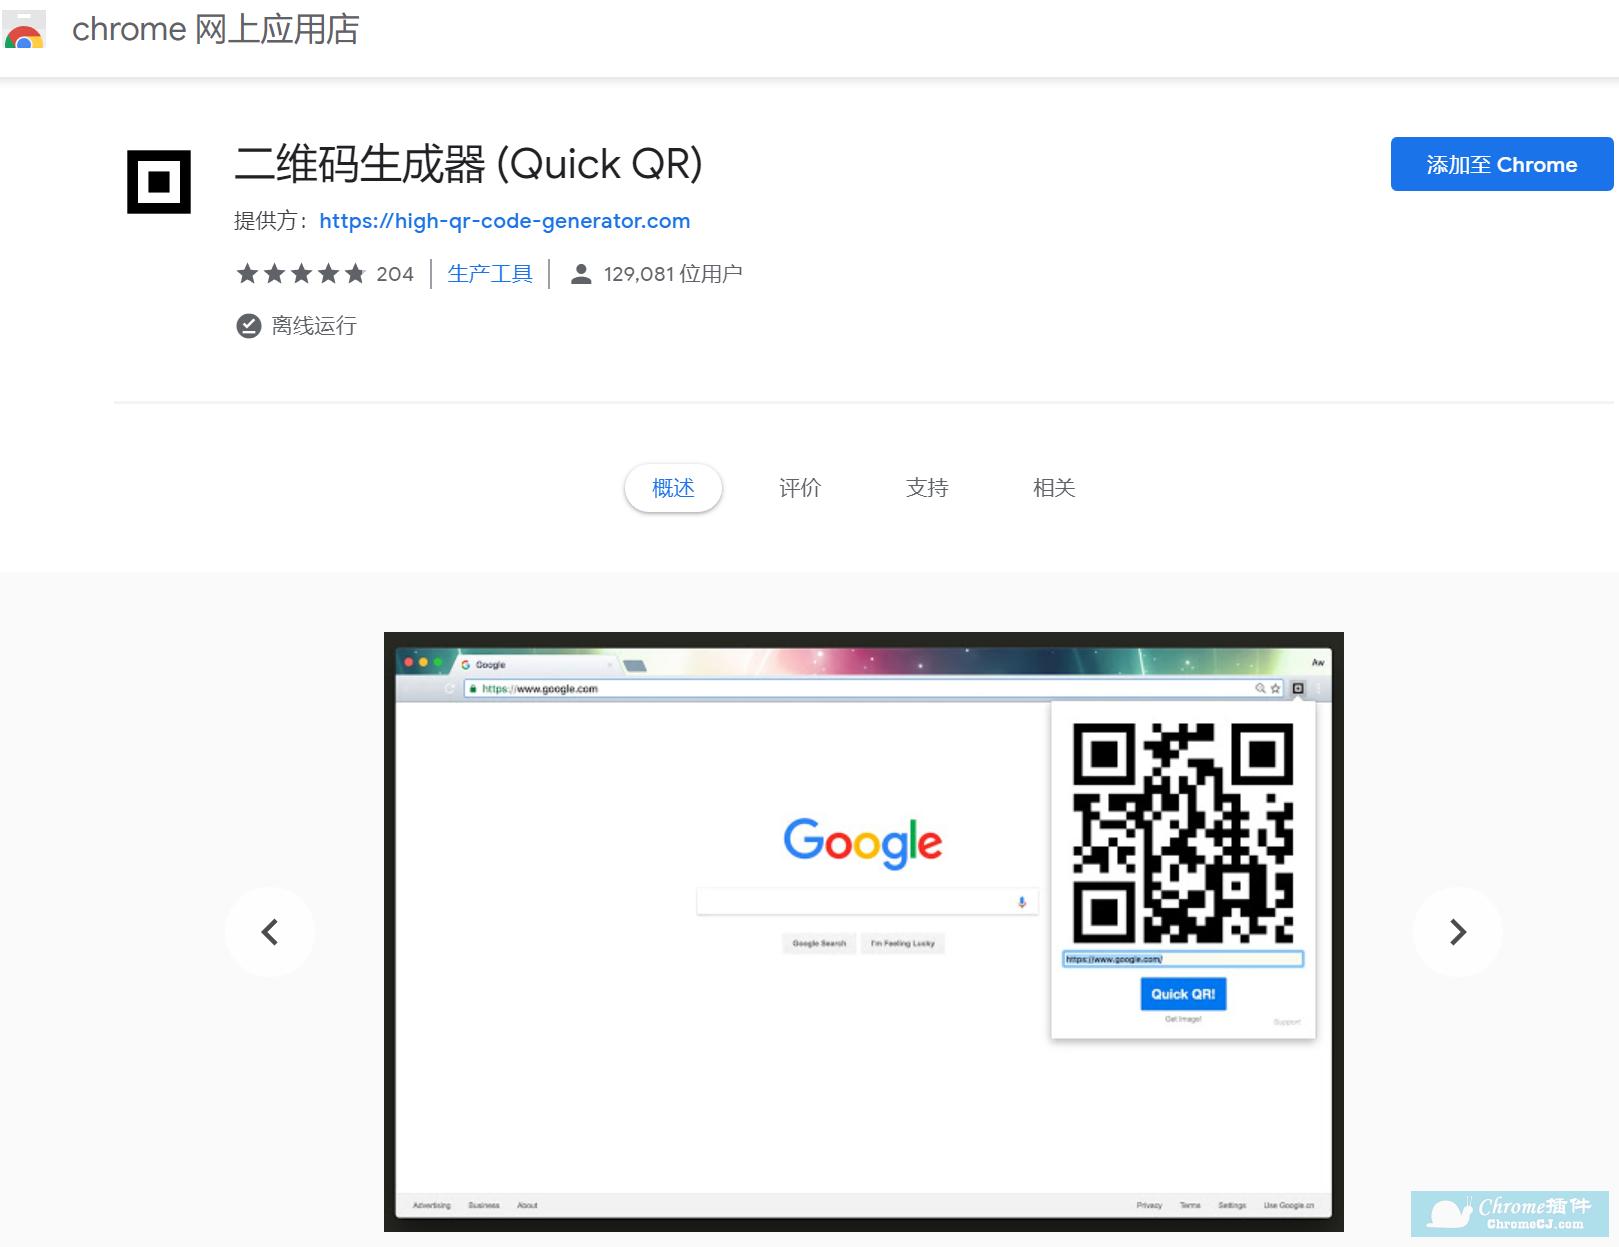 Quick QR二维码生成器简介